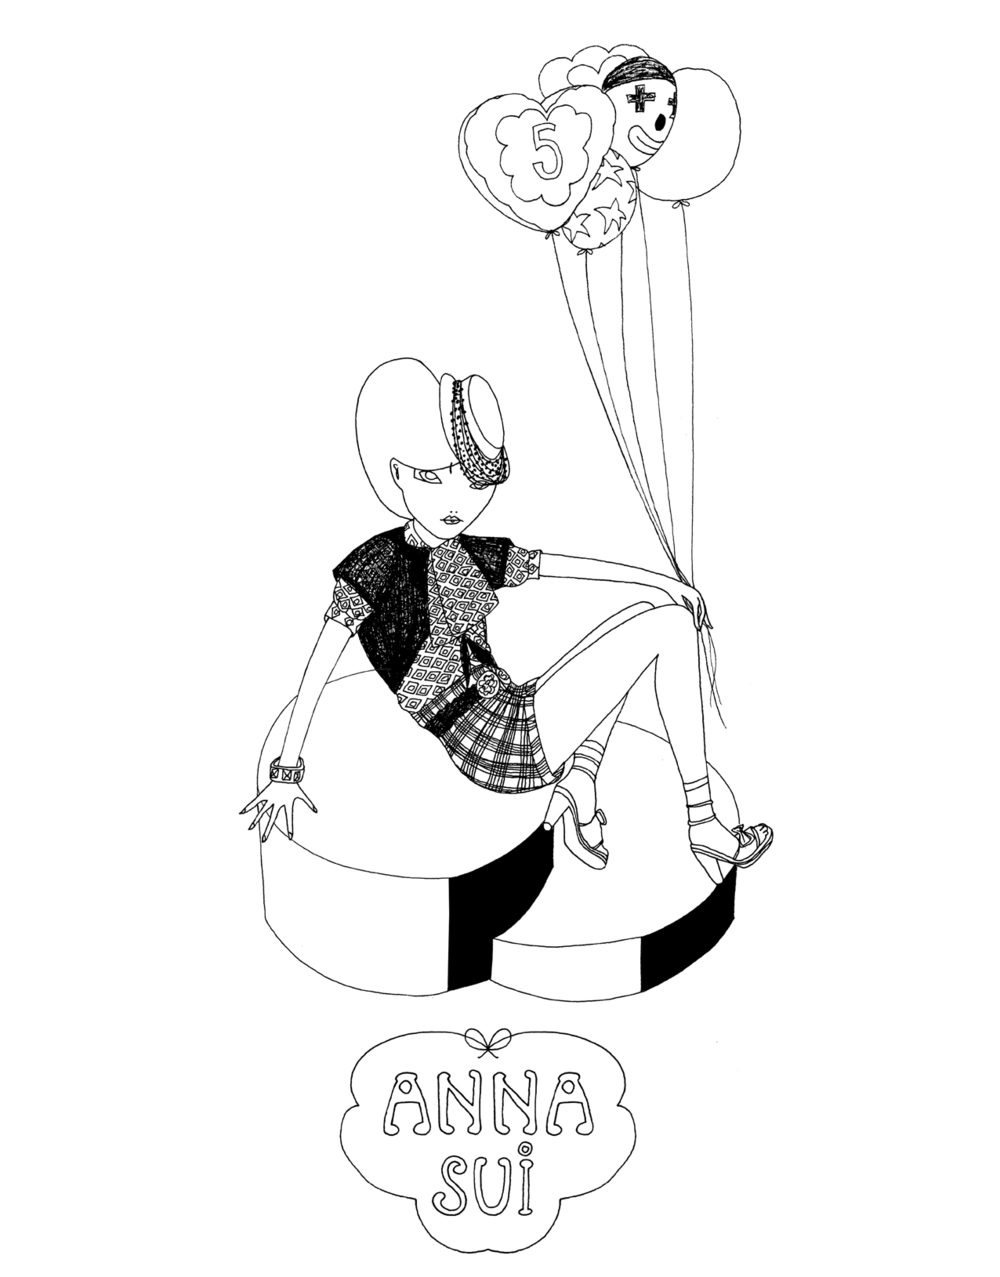 AnnikaWester_annasui1.jpg